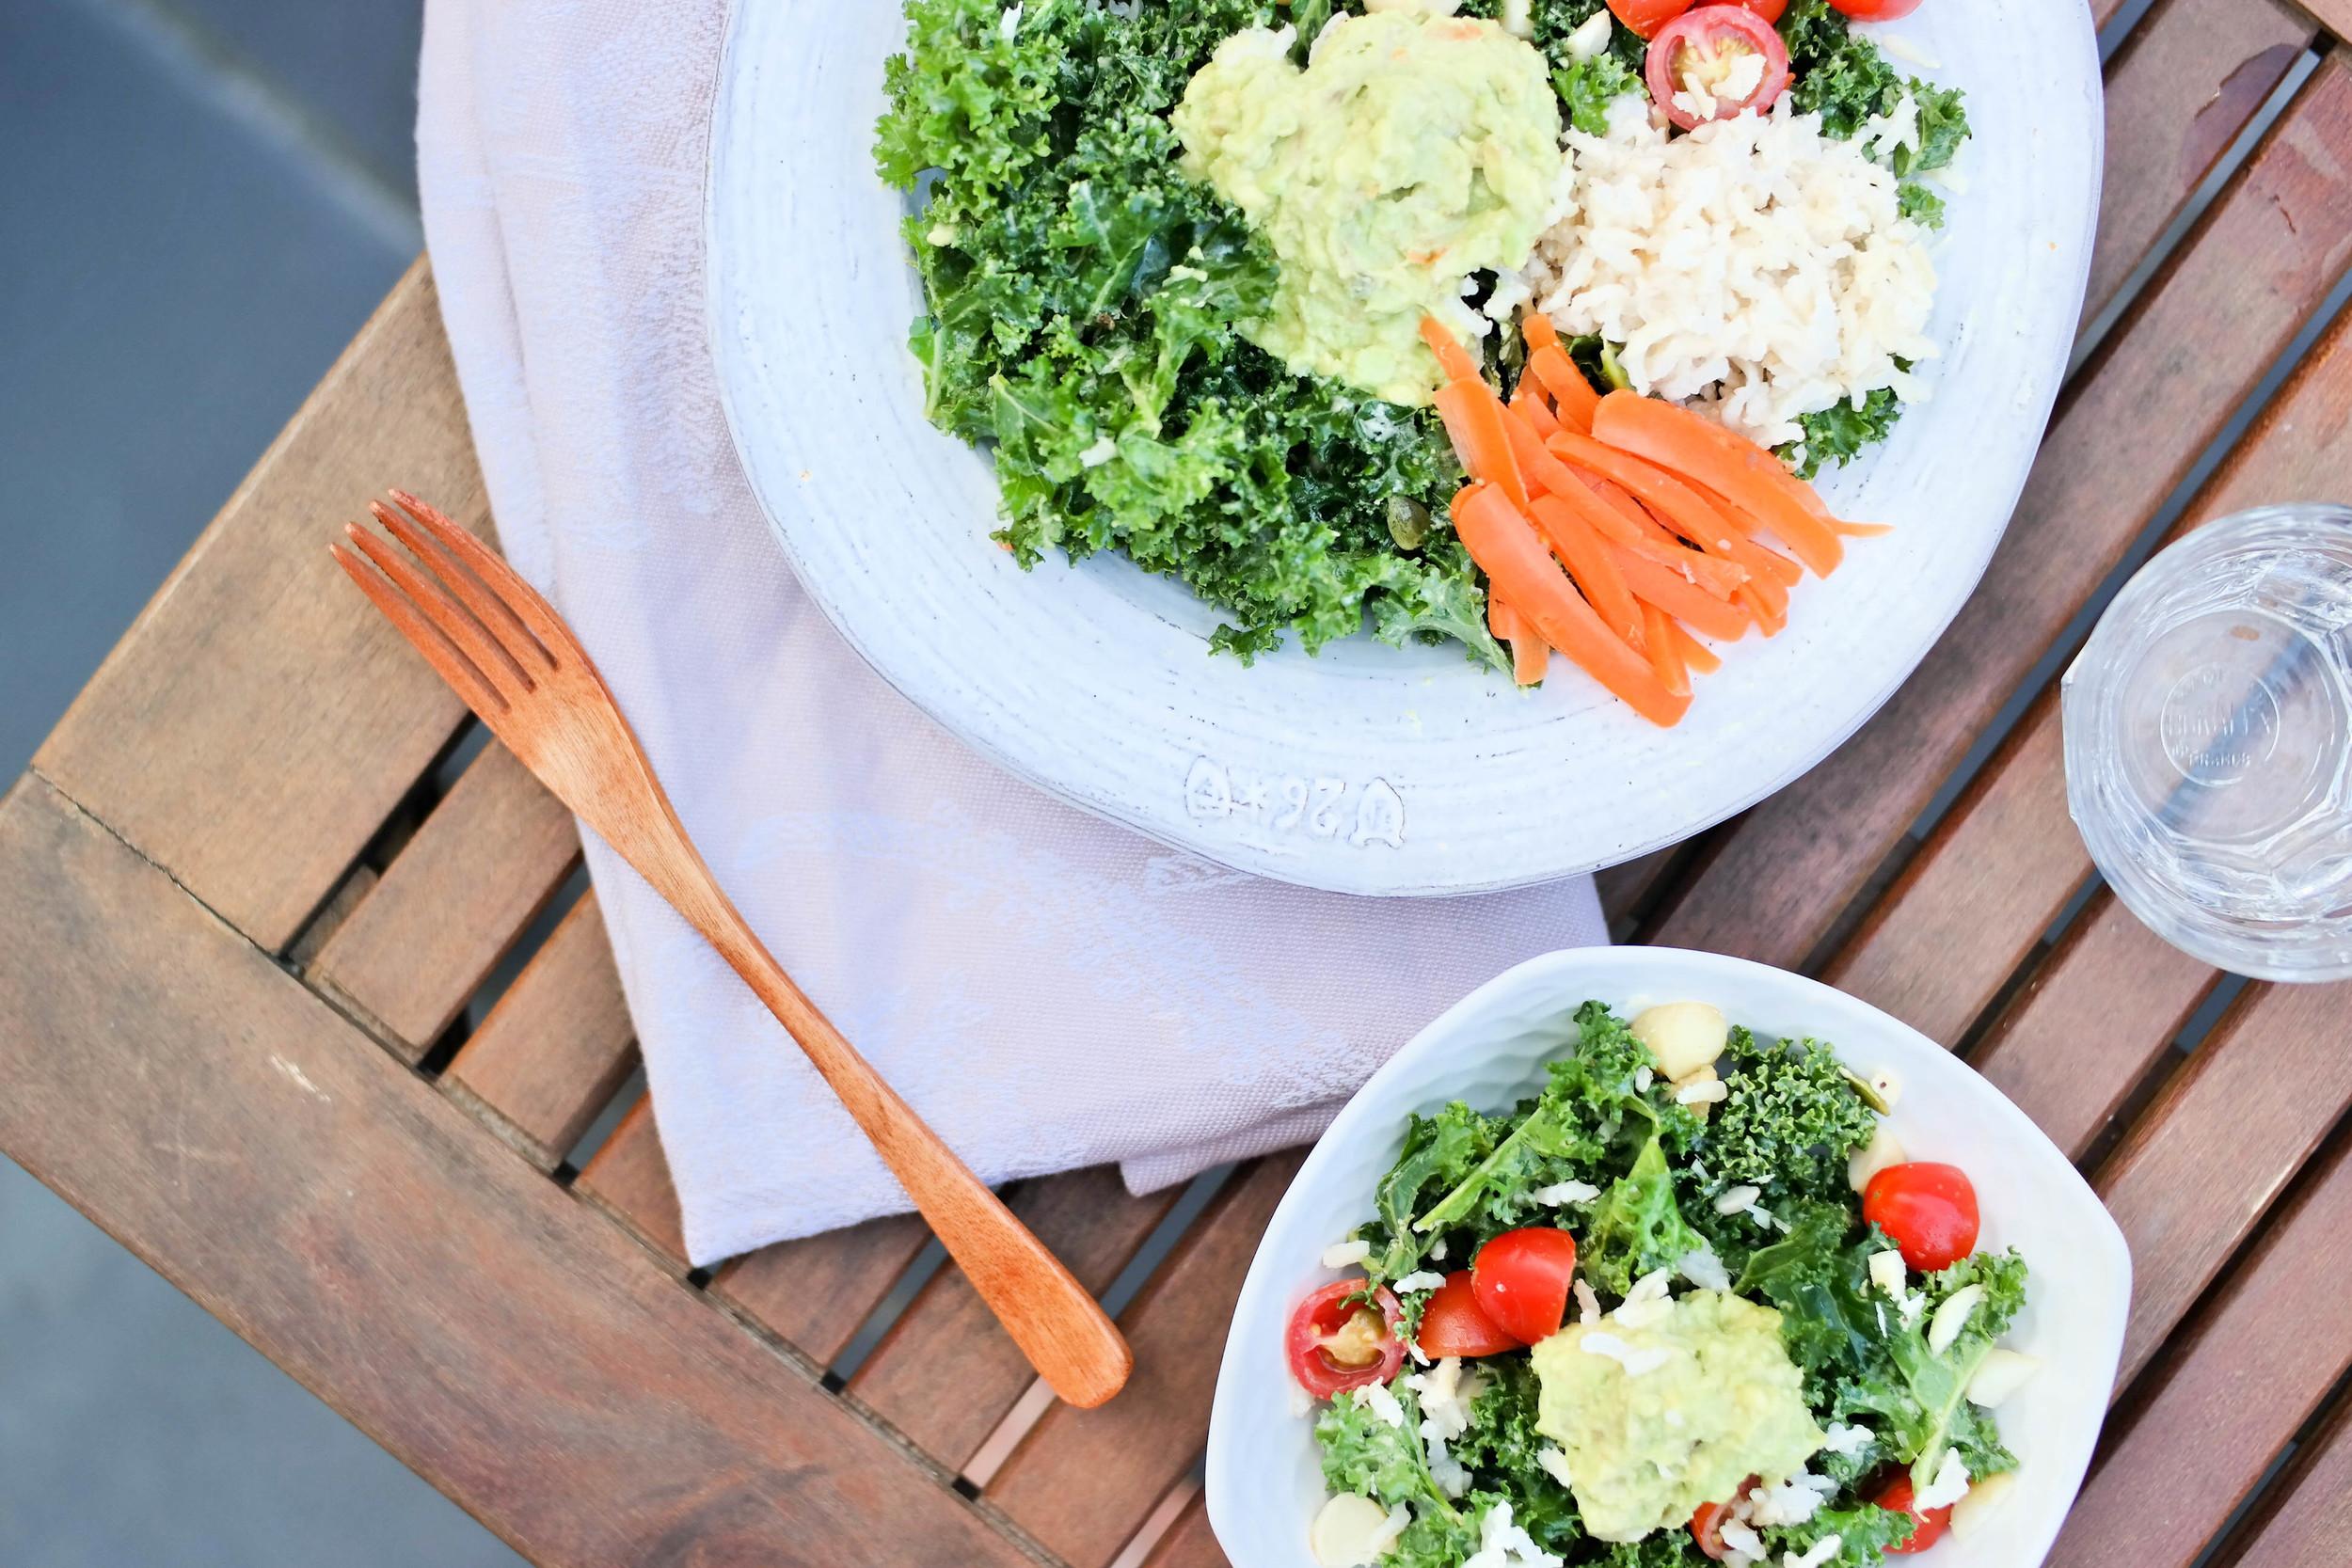 2-http://www.8thandlake.com/home/2015/4/18/a-spring-kale-salad-raw-vegan-healthy-gluten-free-vegetarian